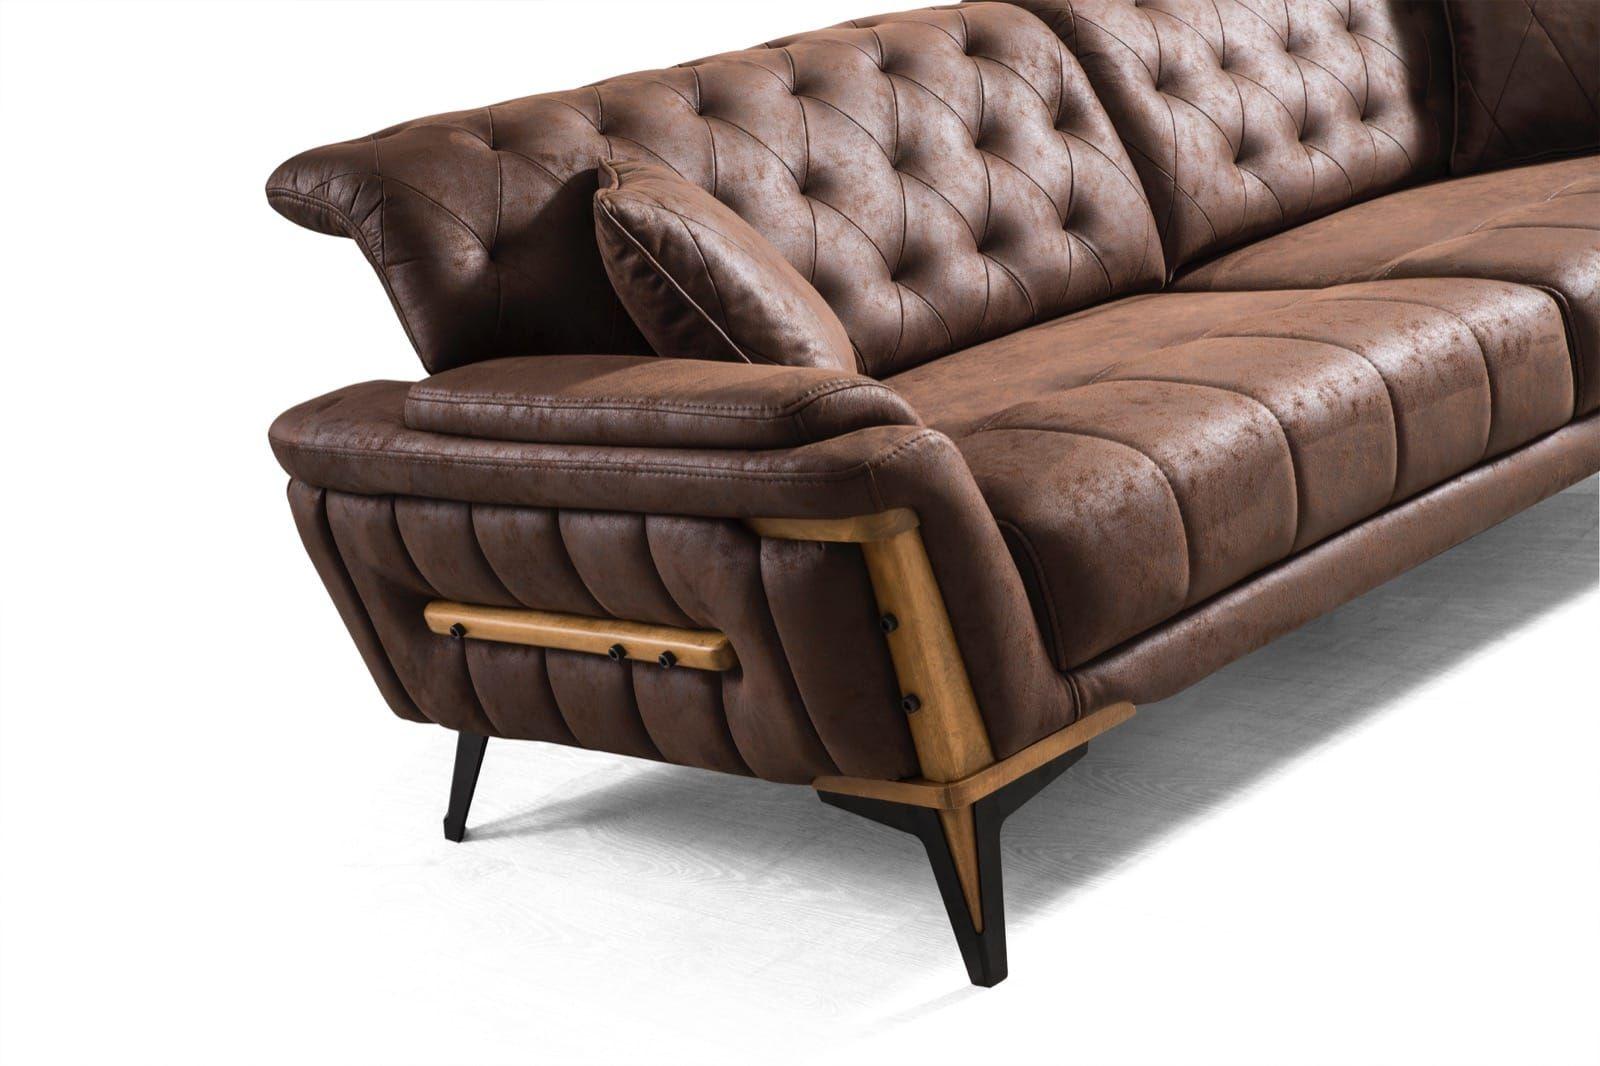 Modern Koltuk Takimi Modern Furniture Living Room Modern Sofa Designs Modern Sofa Set